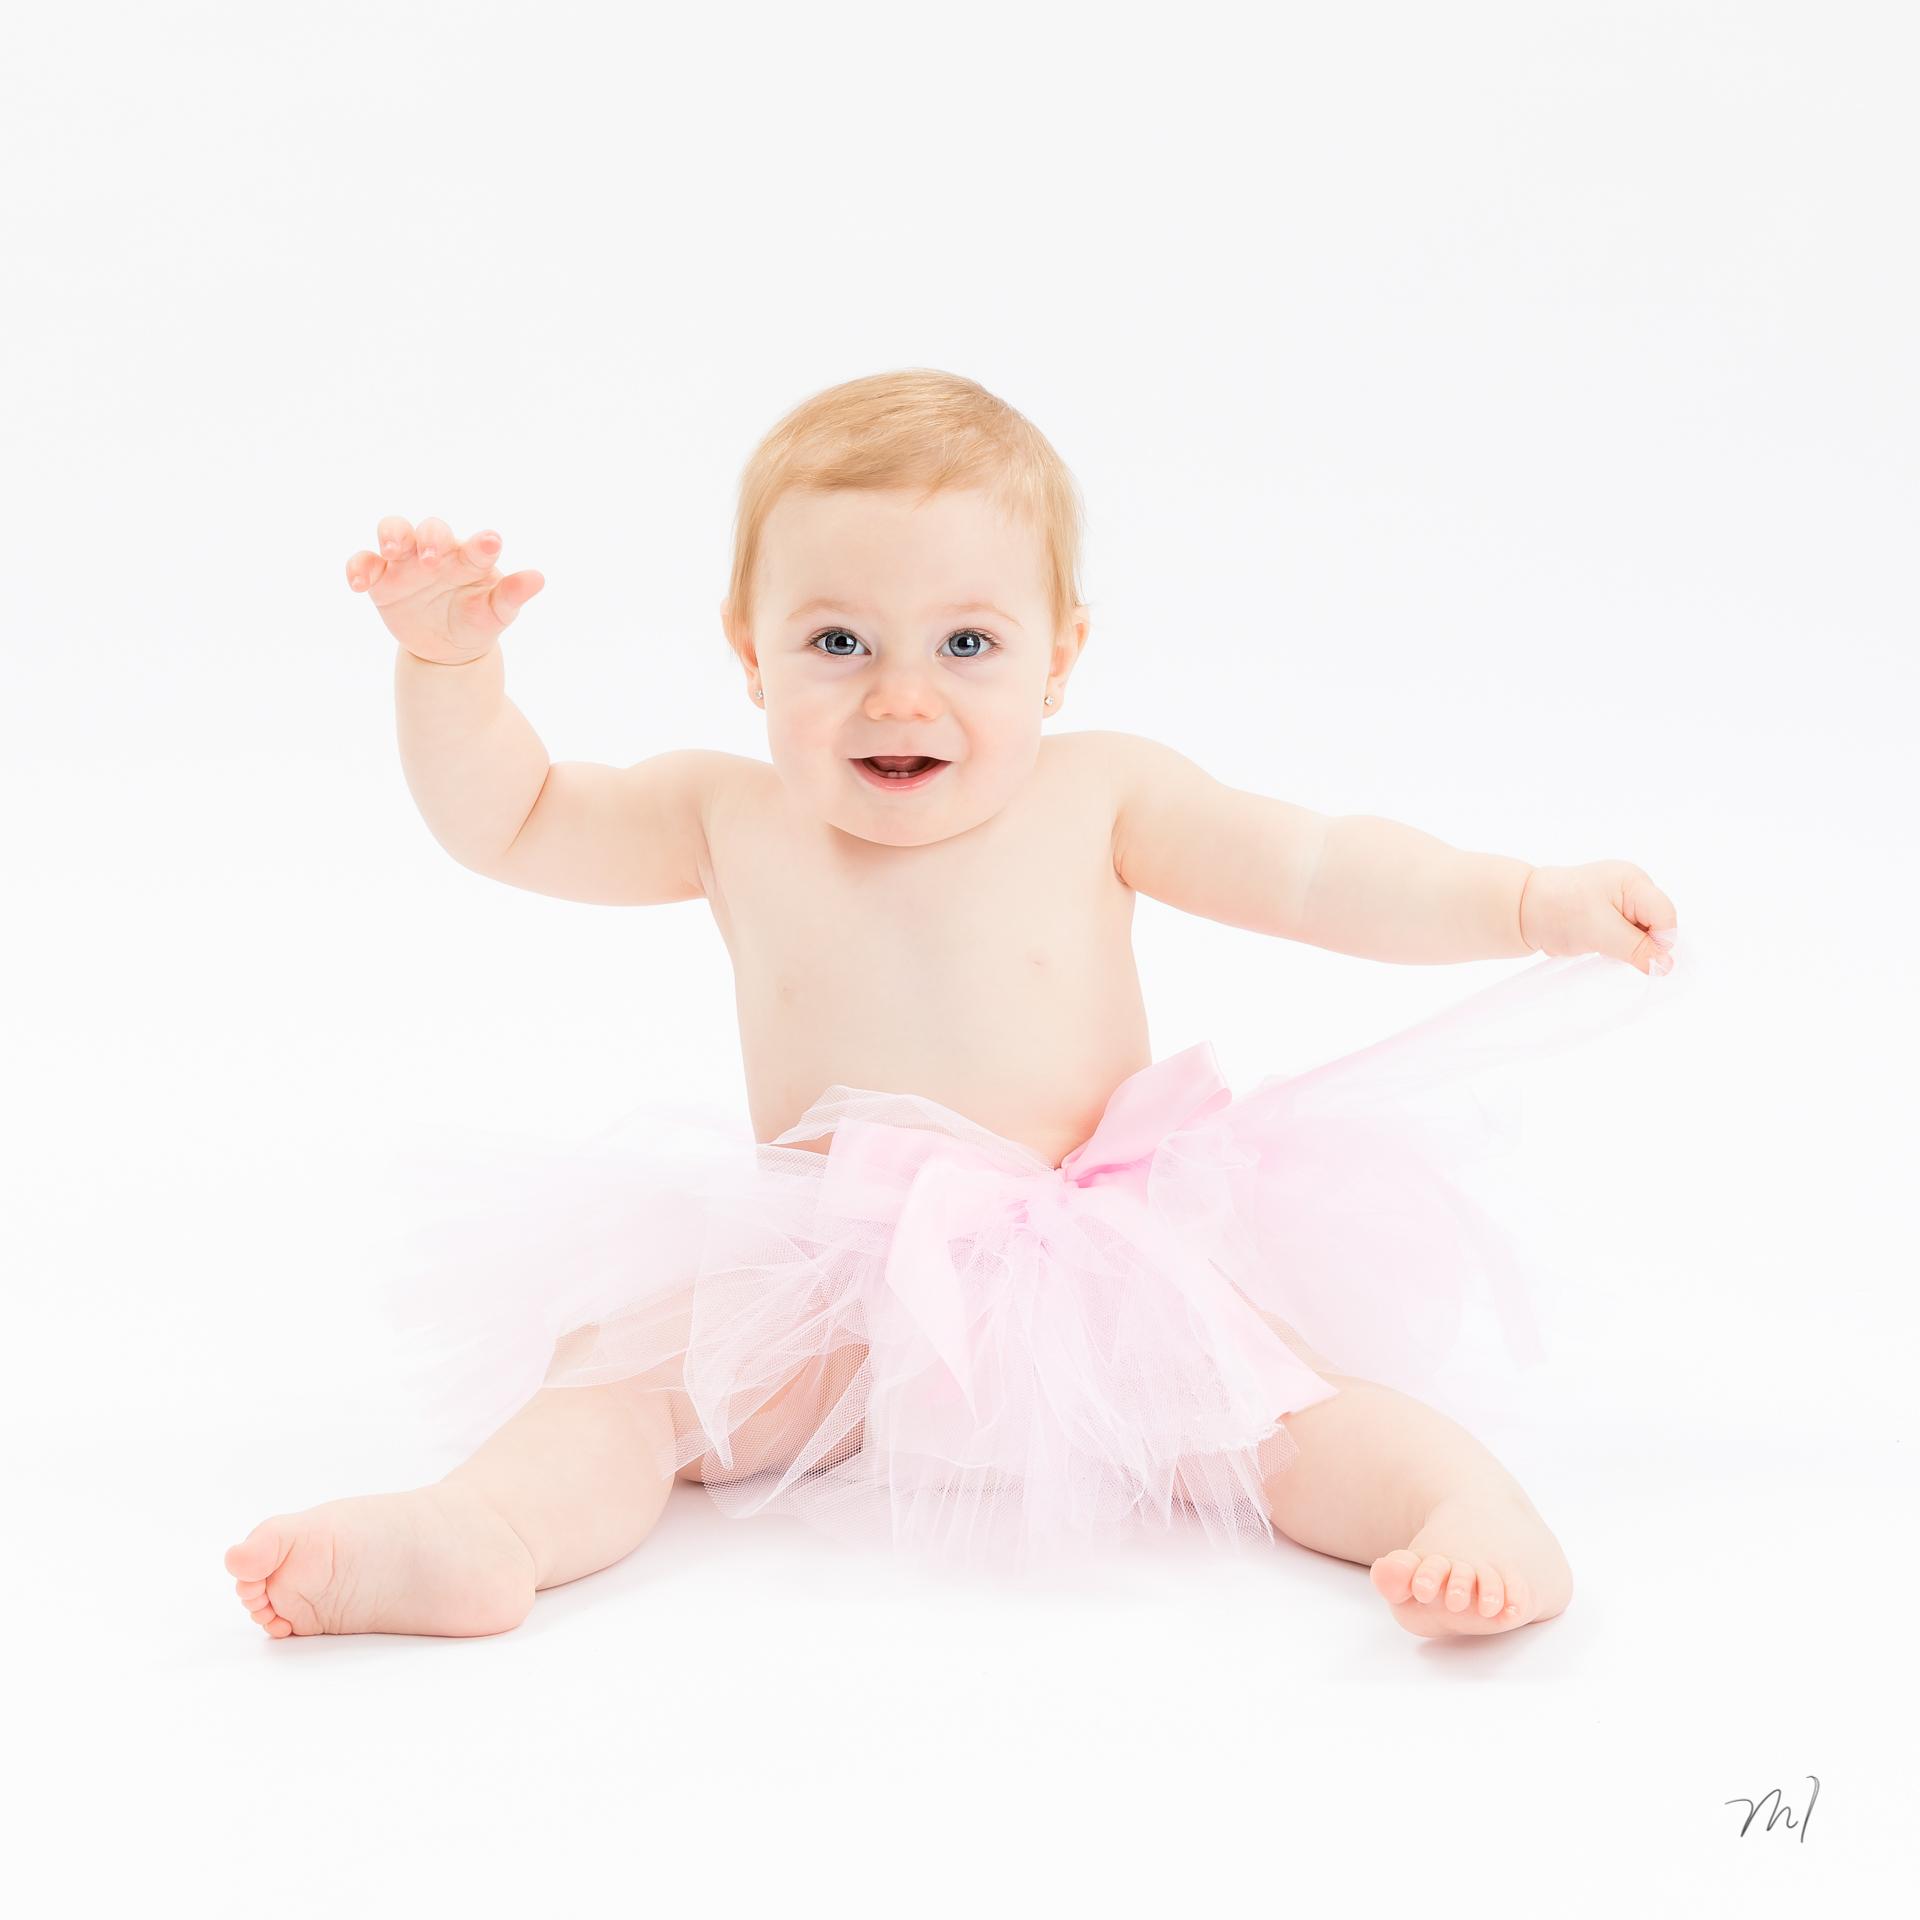 Familles & enfants - Marie Ismalun photographe-29